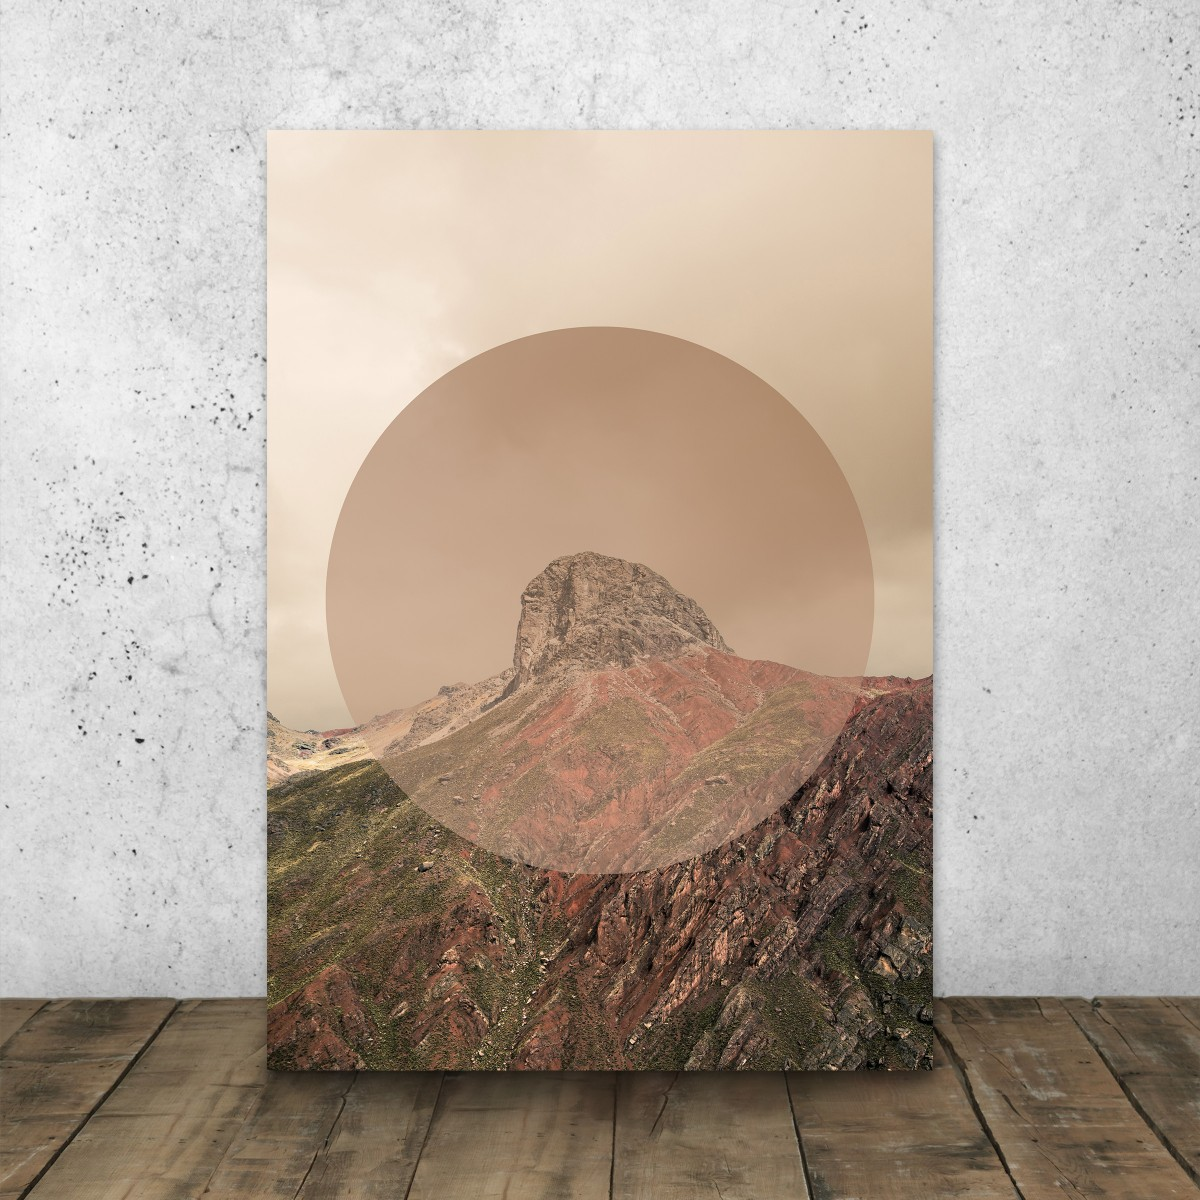 JOE MANIA / Modern Artprint Poster / Landscapes Circular  2 (Peak) DIN A4 - A0